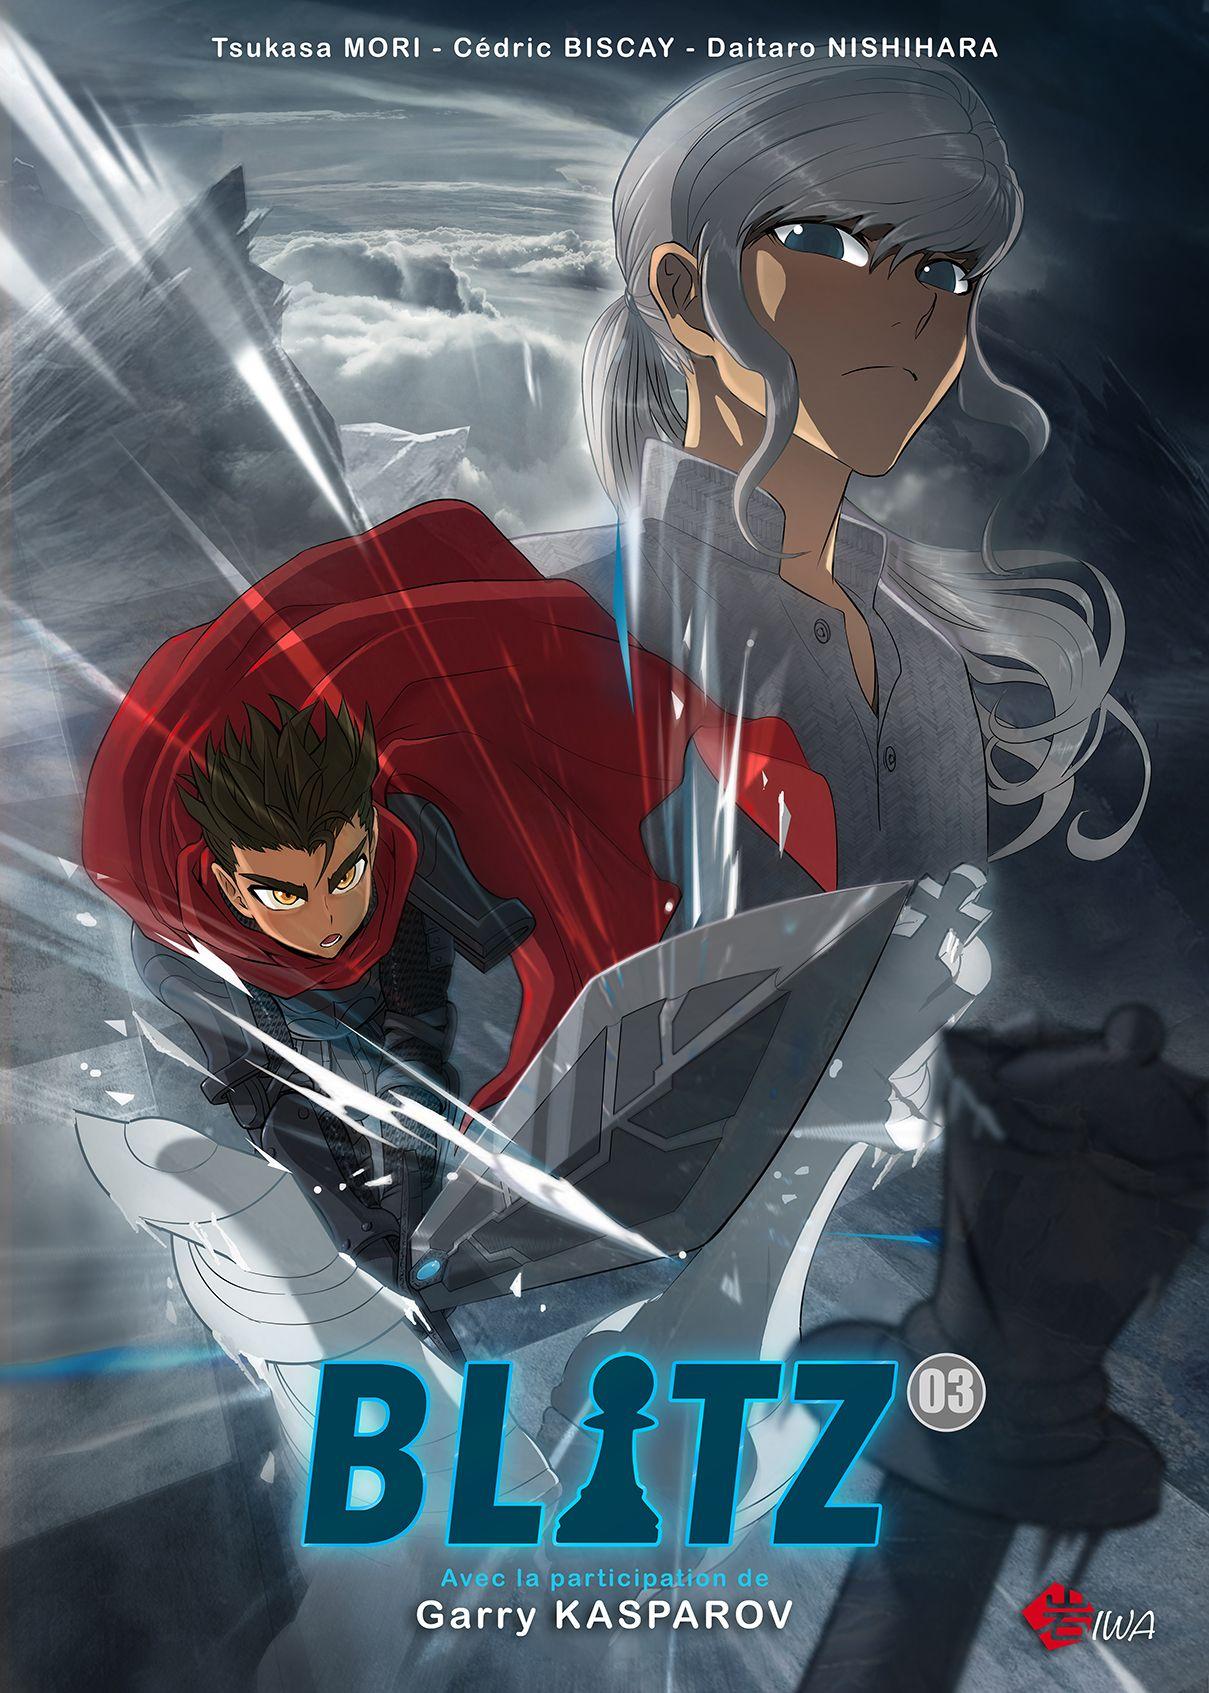 Sortie Manga au Québec JUIN 2021 Blitz-3-iwa